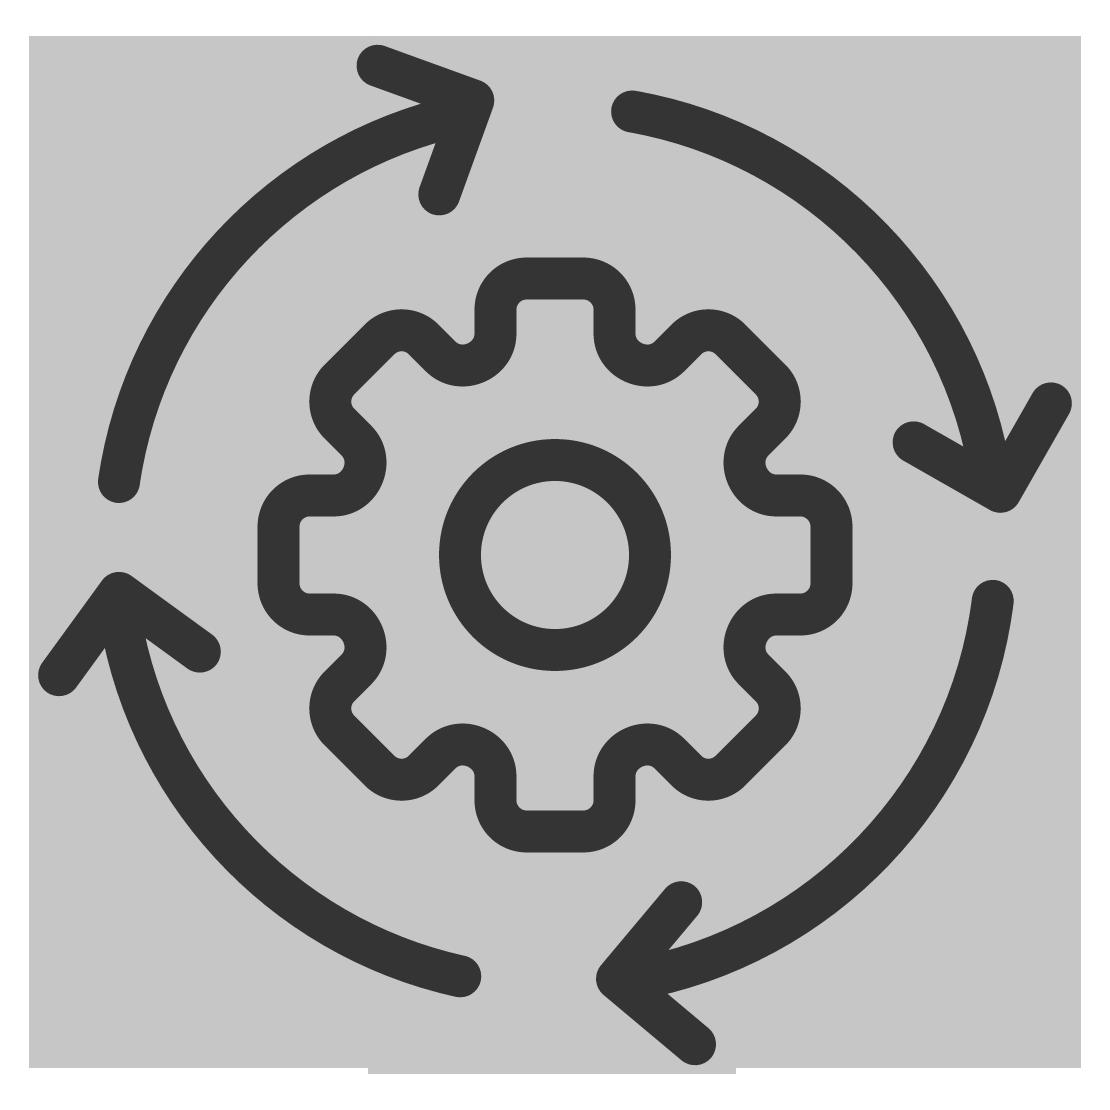 OTE GmbH-Zahnrad-runde Pfeil-Icon